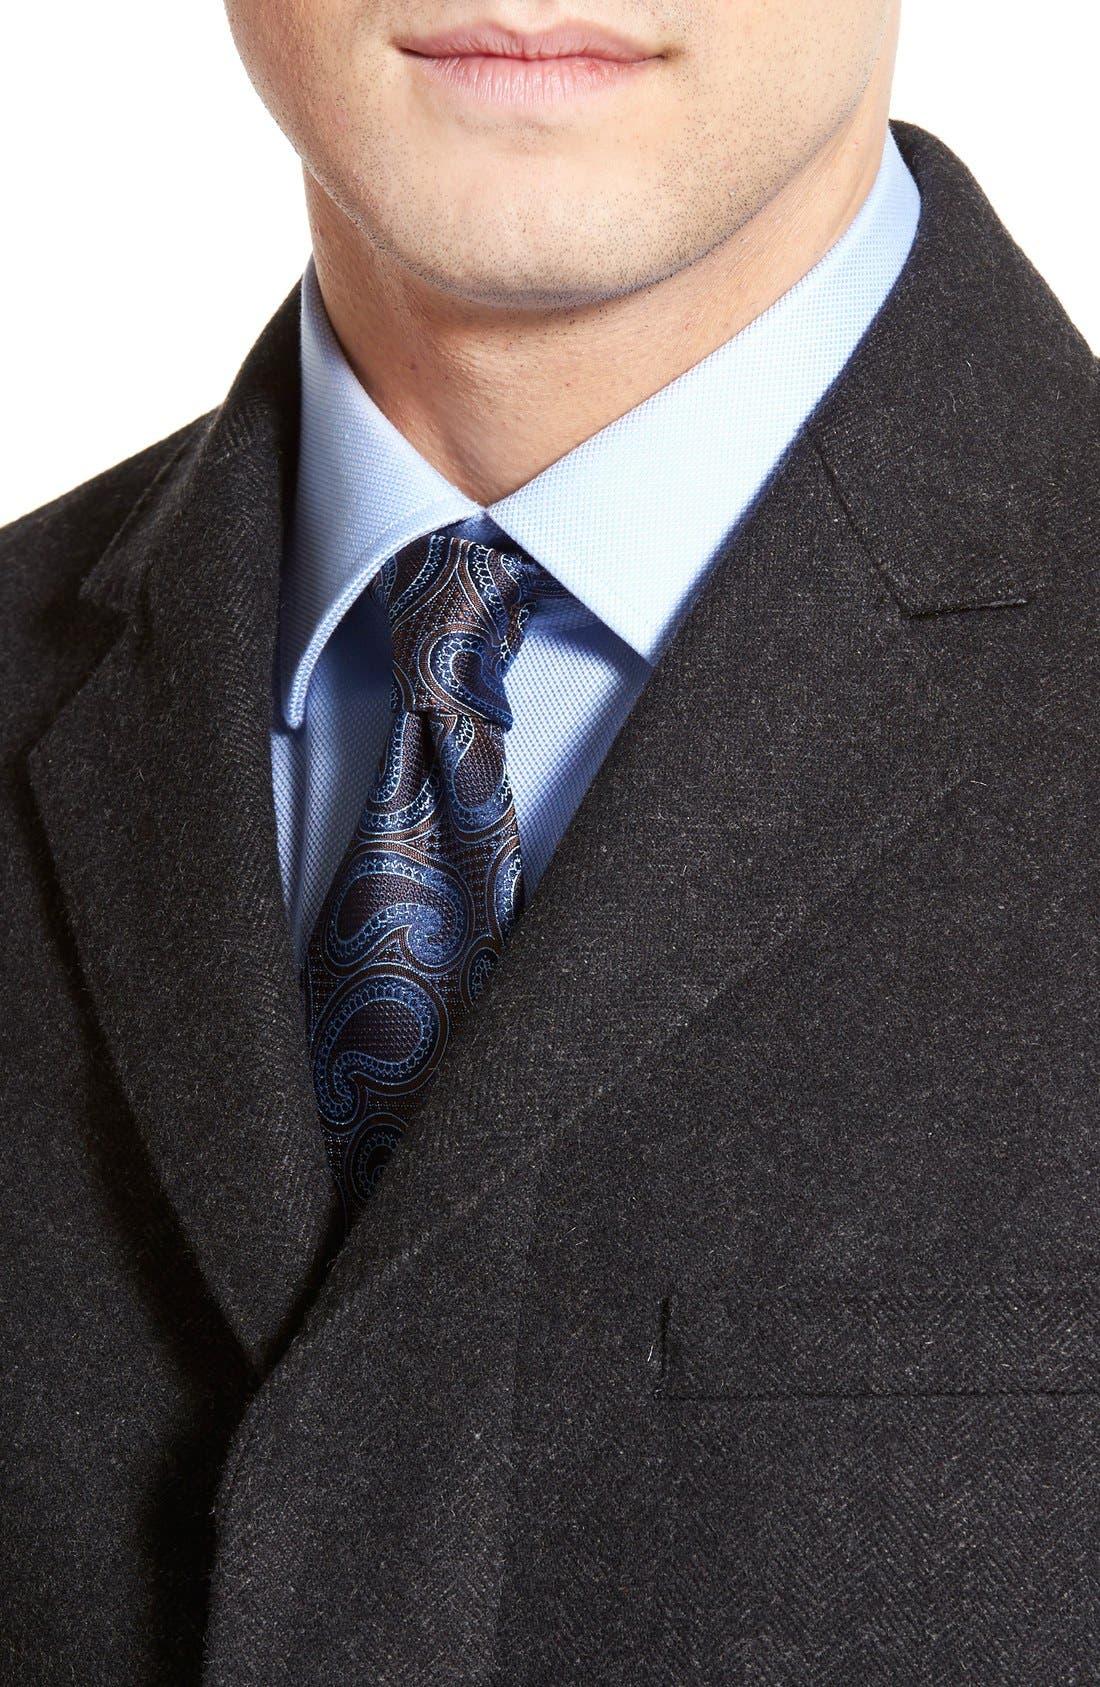 Maitland Modern Fit Wool Blend Overcoat,                             Alternate thumbnail 2, color,                             035